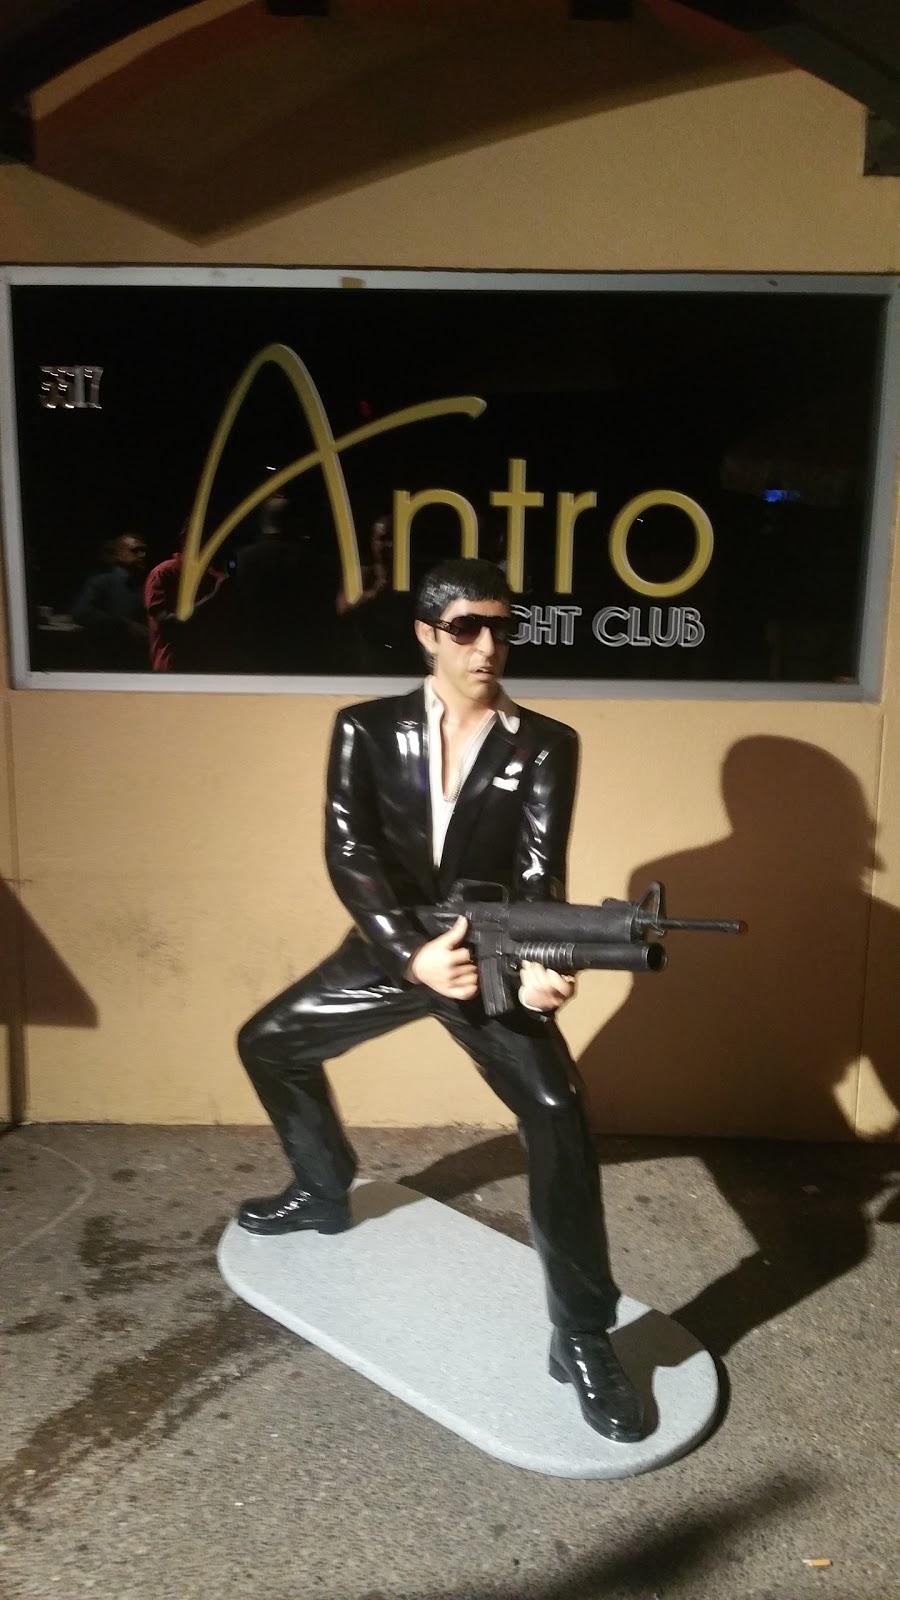 Antro Night Club - night club  | Photo 2 of 7 | Address: 5517 McPherson Rd, Laredo, TX 78041, USA | Phone: (956) 480-7341